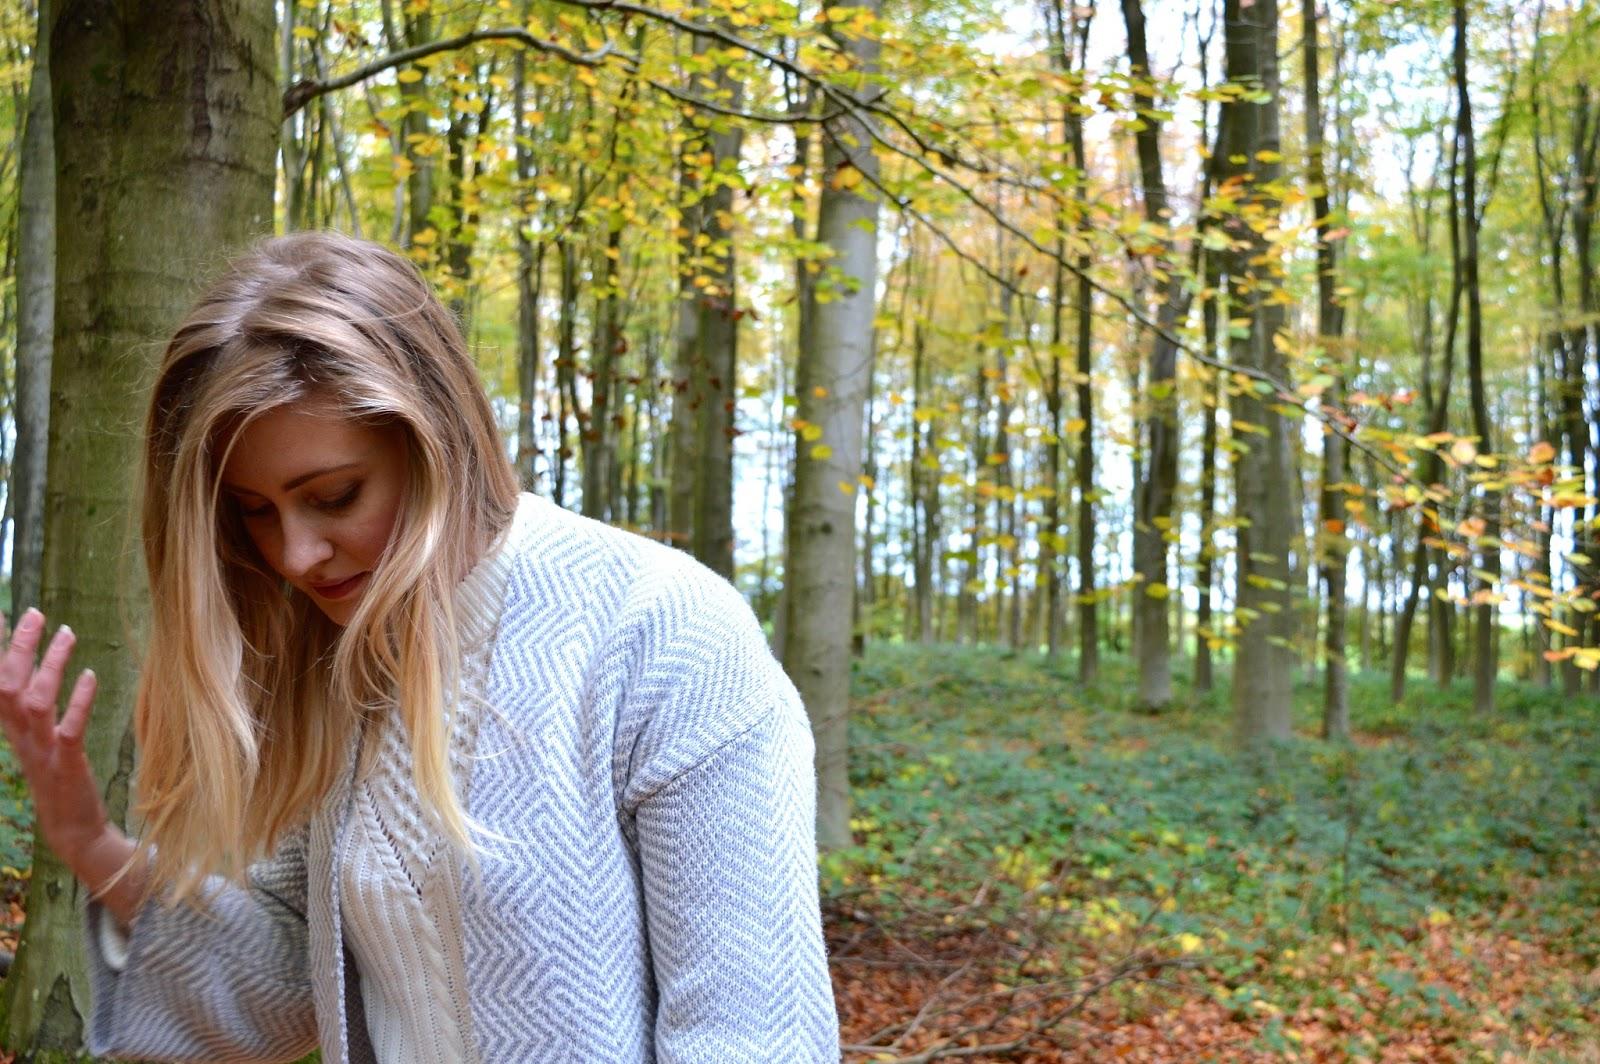 Autumn fashion inspiration, Hampshire bloggers, fashion bloggers, UK fashion blog